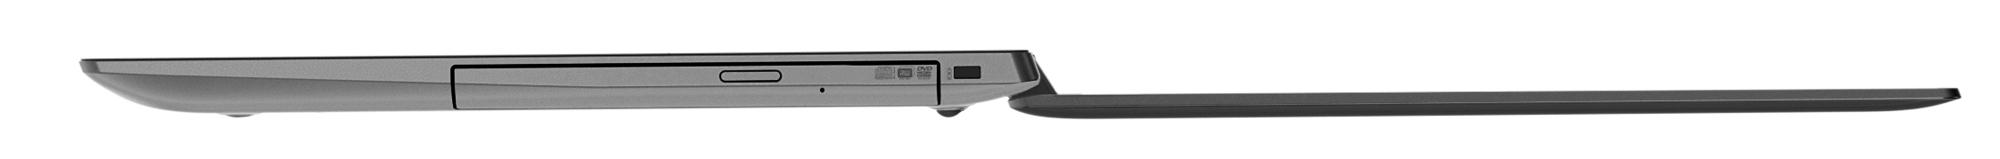 Фото  Ноутбук Lenovo ideapad 330-15 Onyx Black (81DE012JRA)